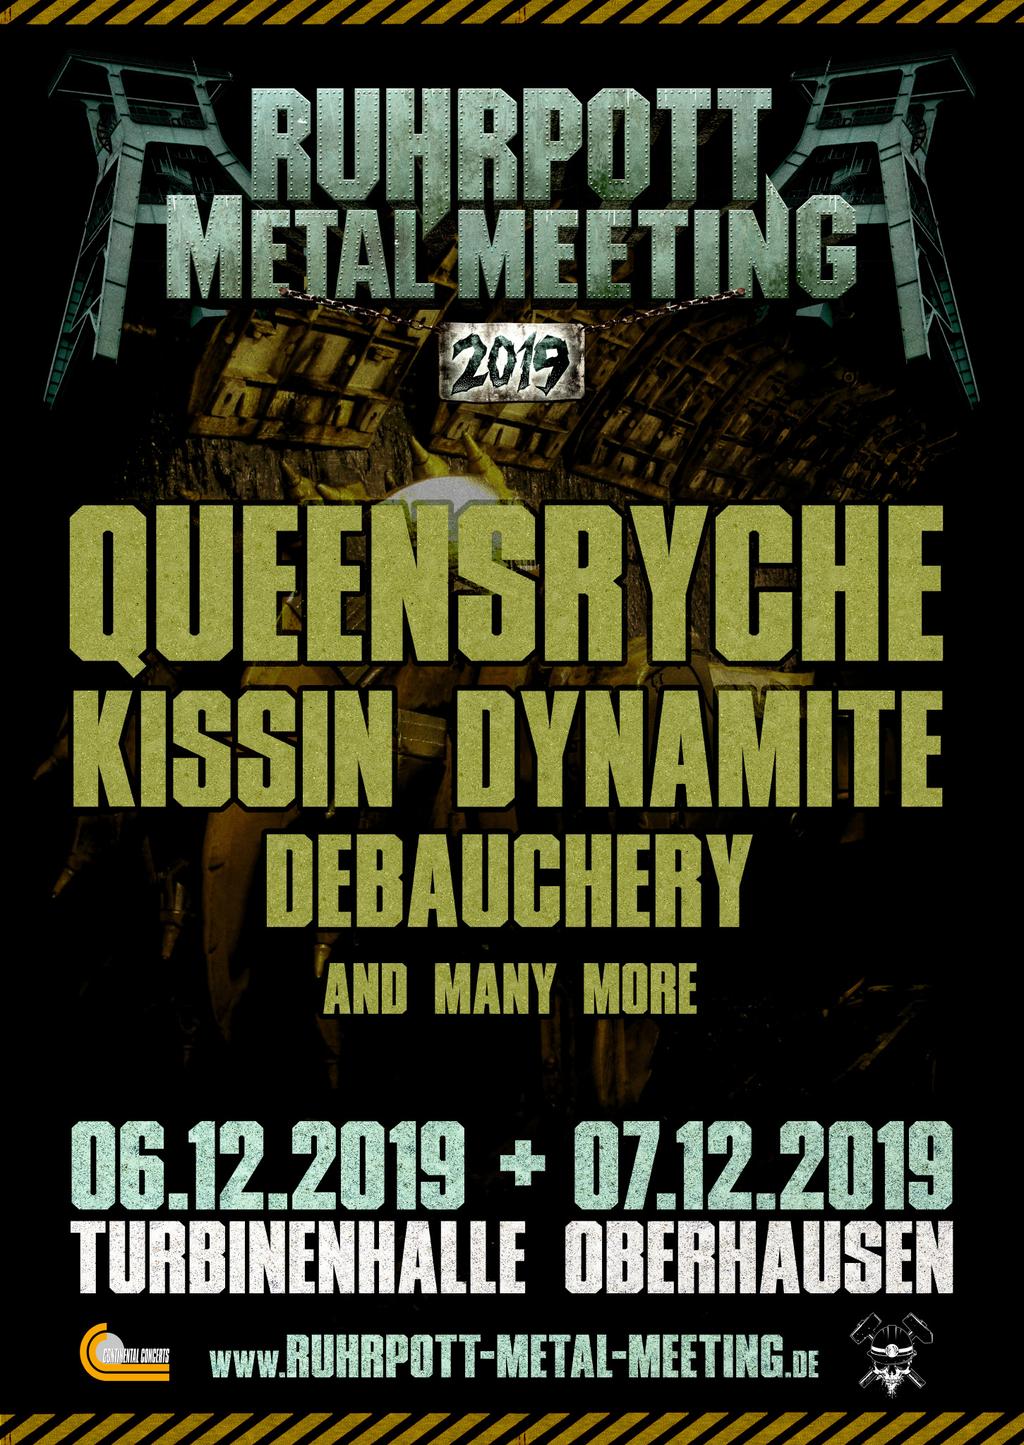 Ruhrpott Metal